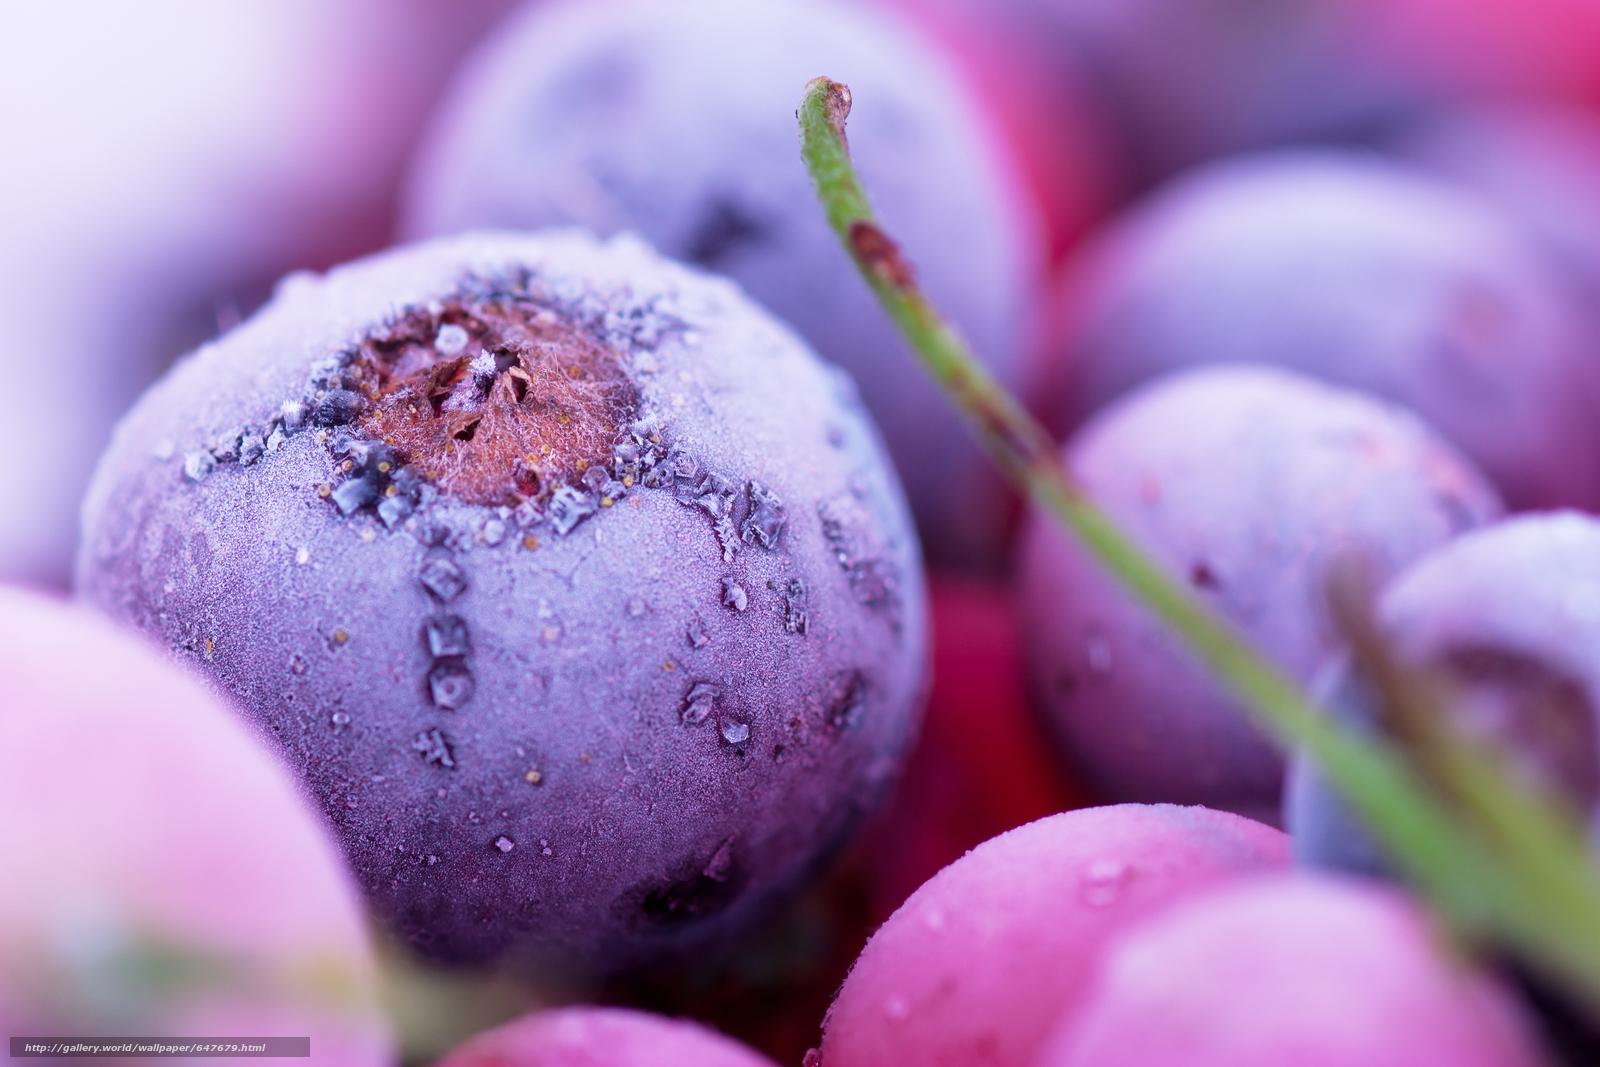 Download wallpaper Macro View of Frozen Berries,  frozen berries,  frost free desktop wallpaper in the resolution 8000x5334 — picture №647679